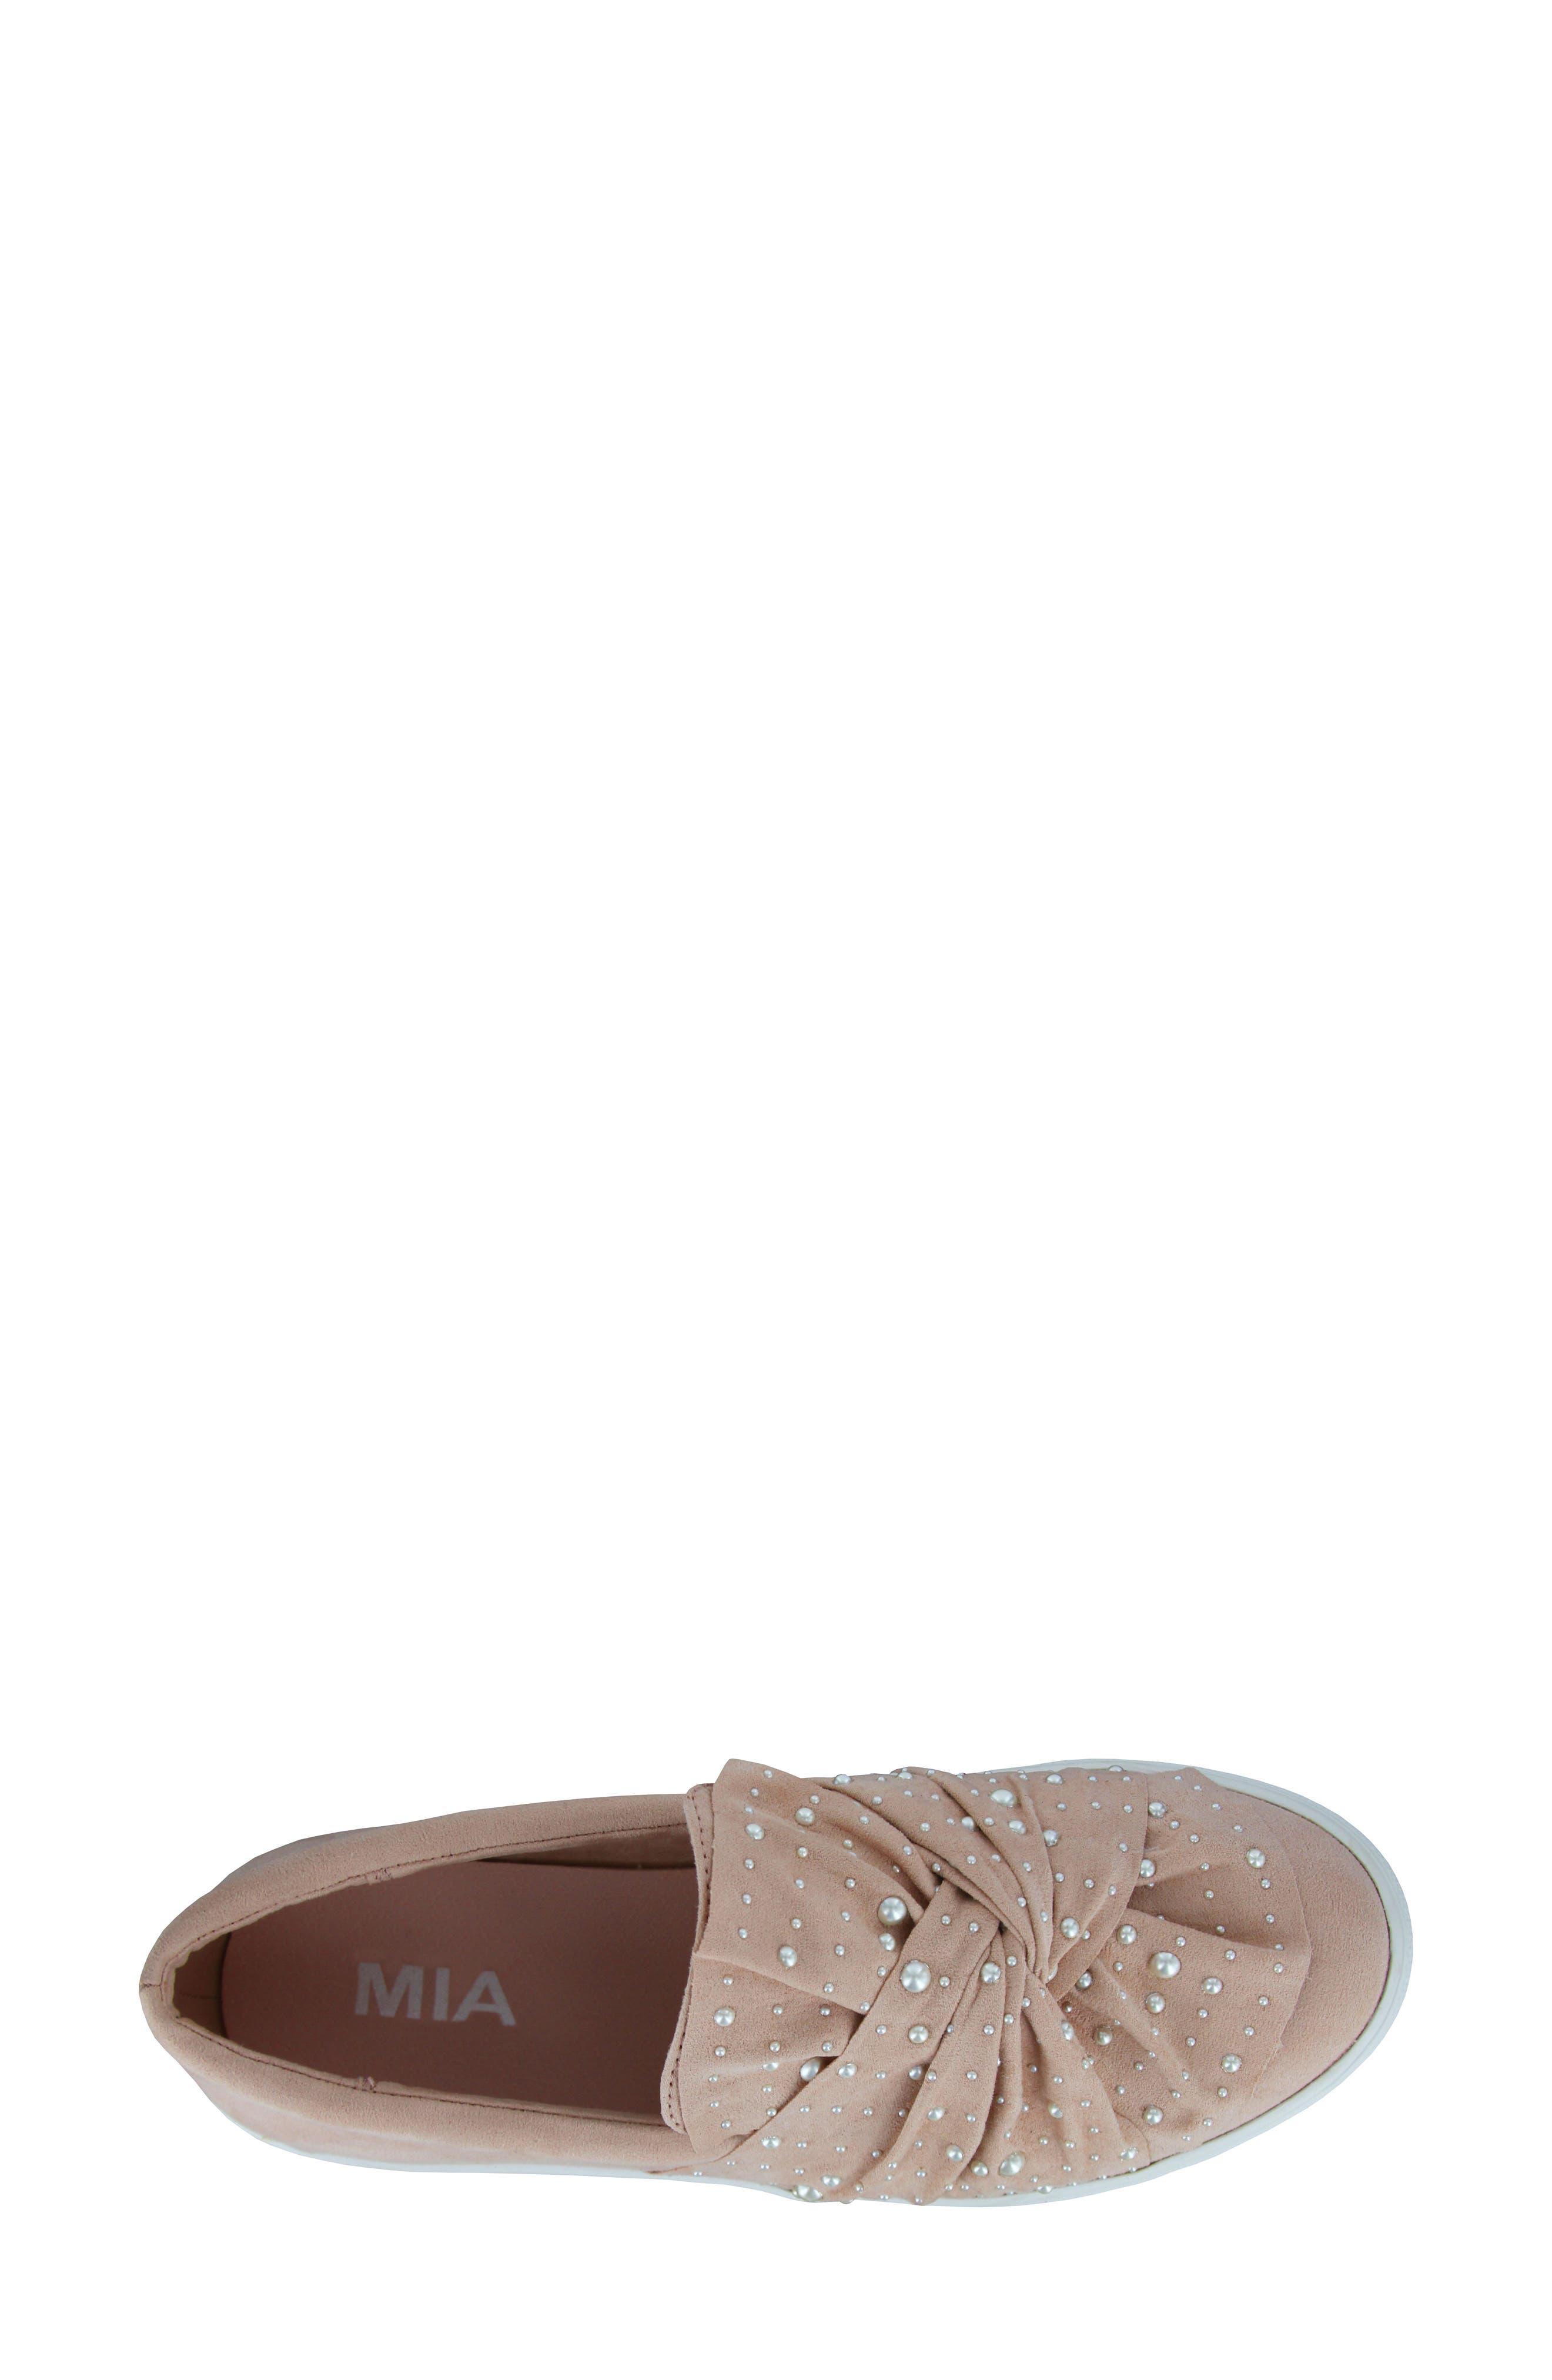 Aretha Embellished Slip-On Sneaker,                             Alternate thumbnail 6, color,